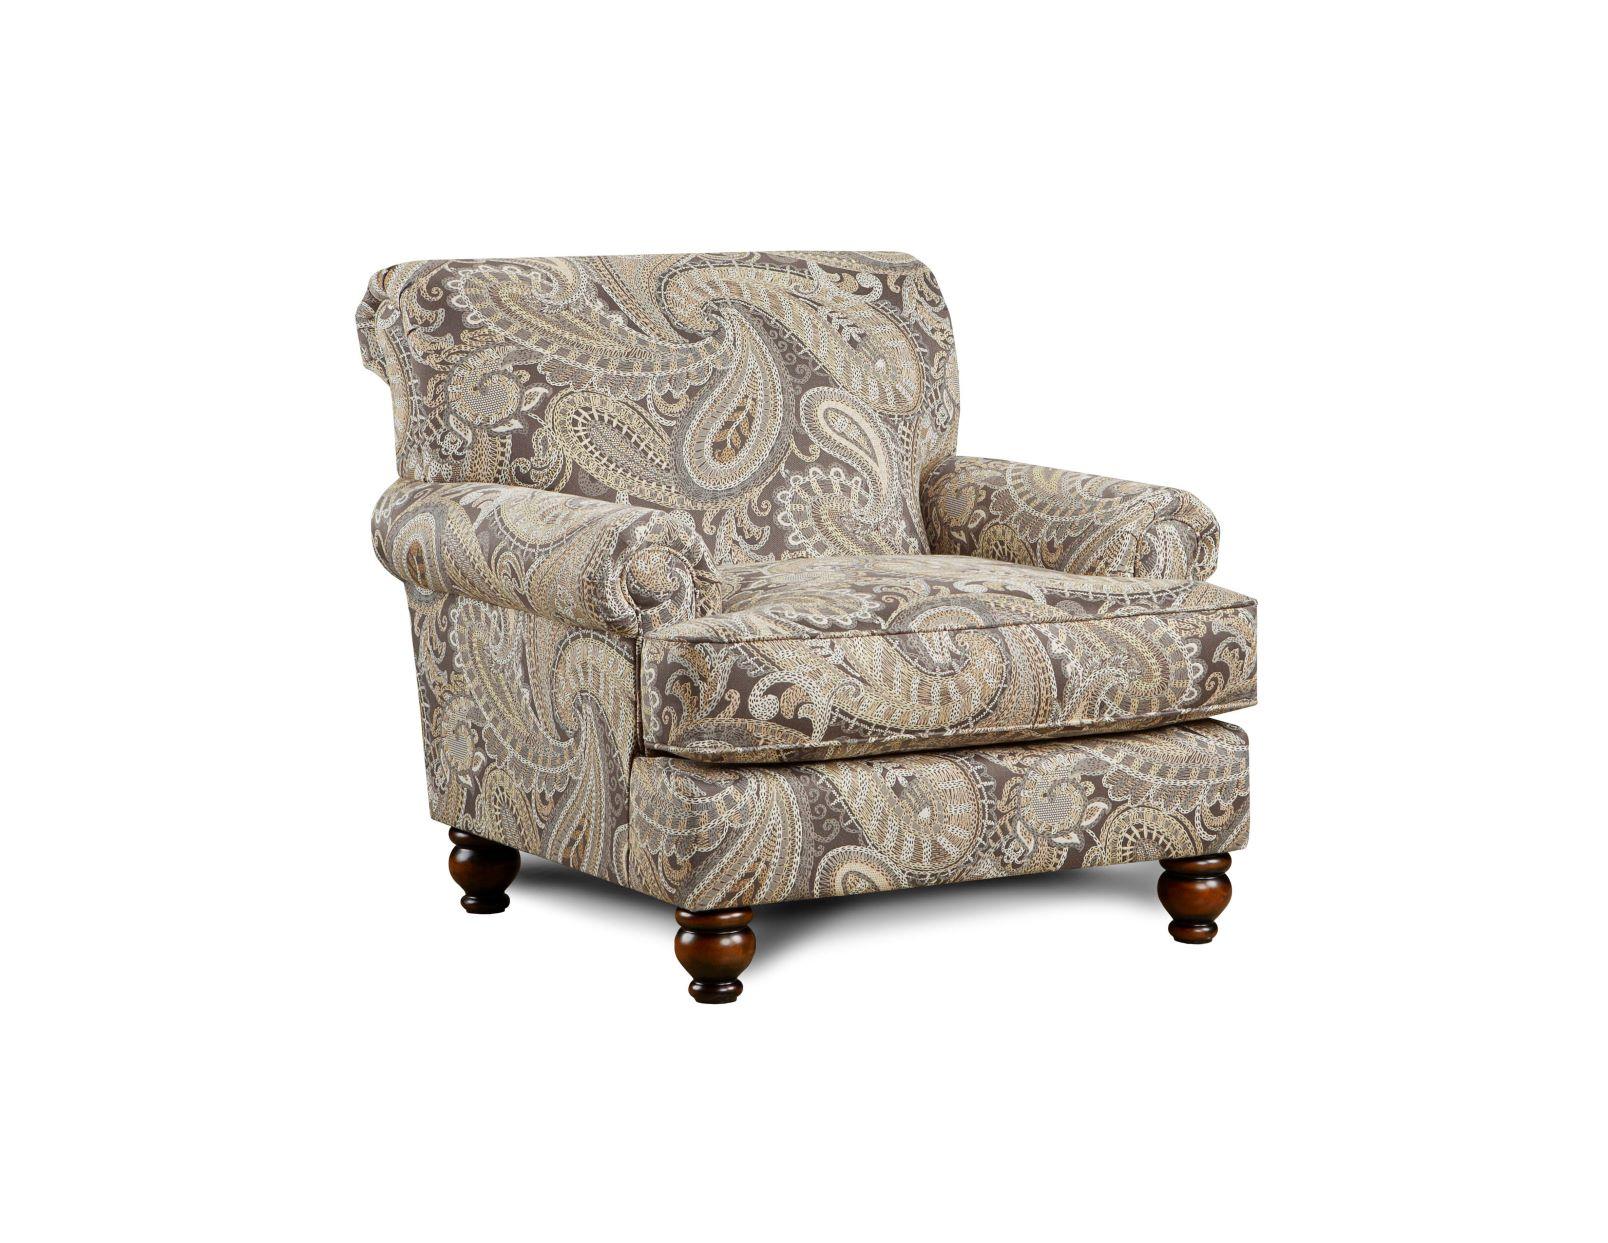 Capernicus Cobbleston Fusion Furniture chair, Carys Doe collection